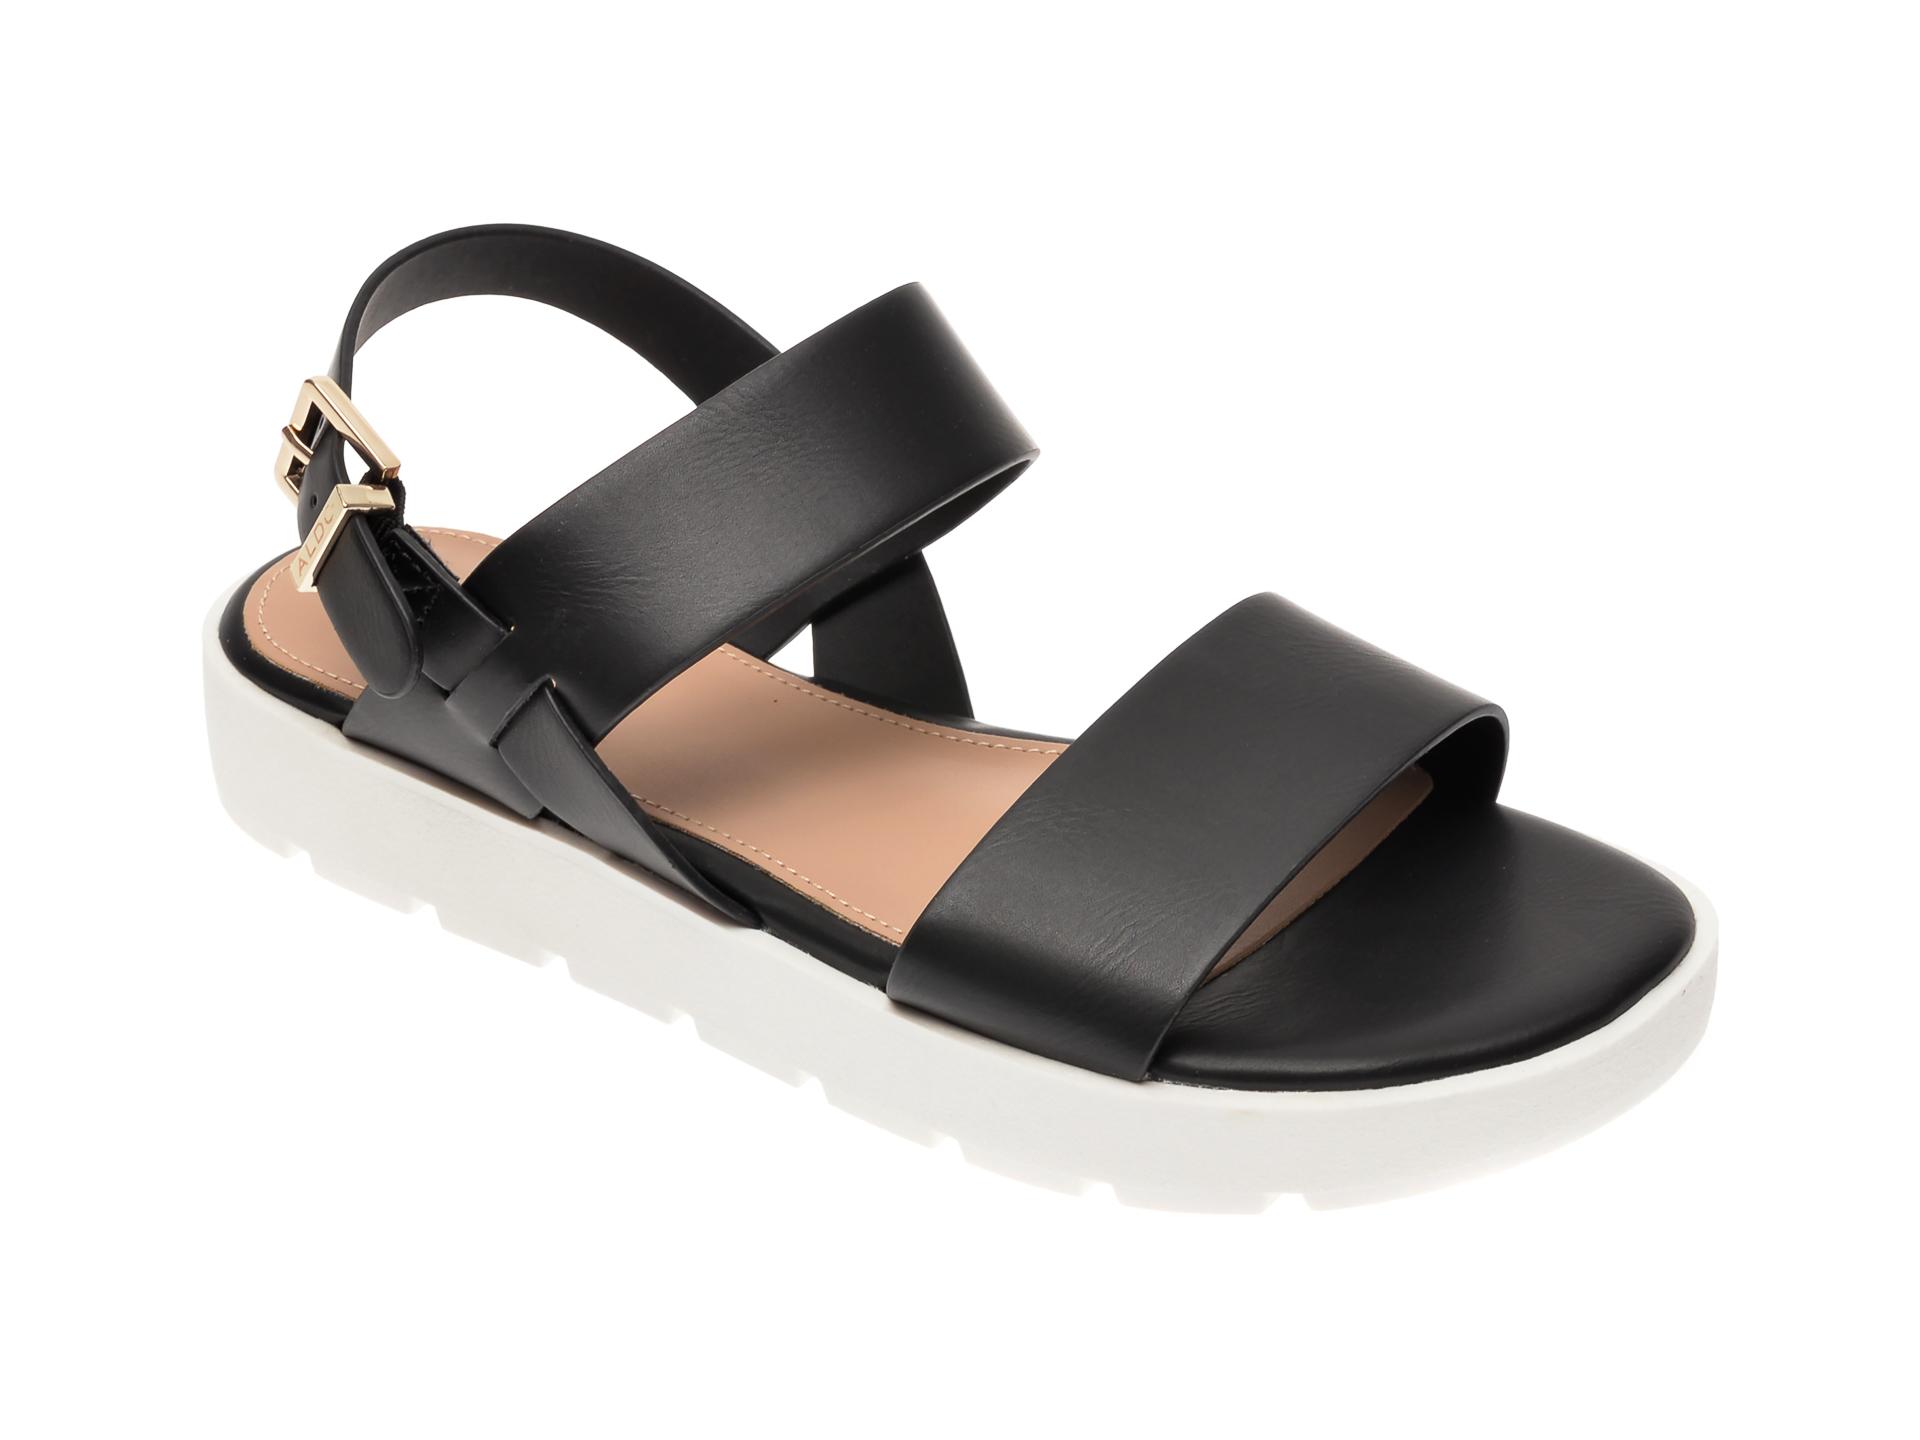 Sandale ALDO negre, Dwylia001, din piele ecologica